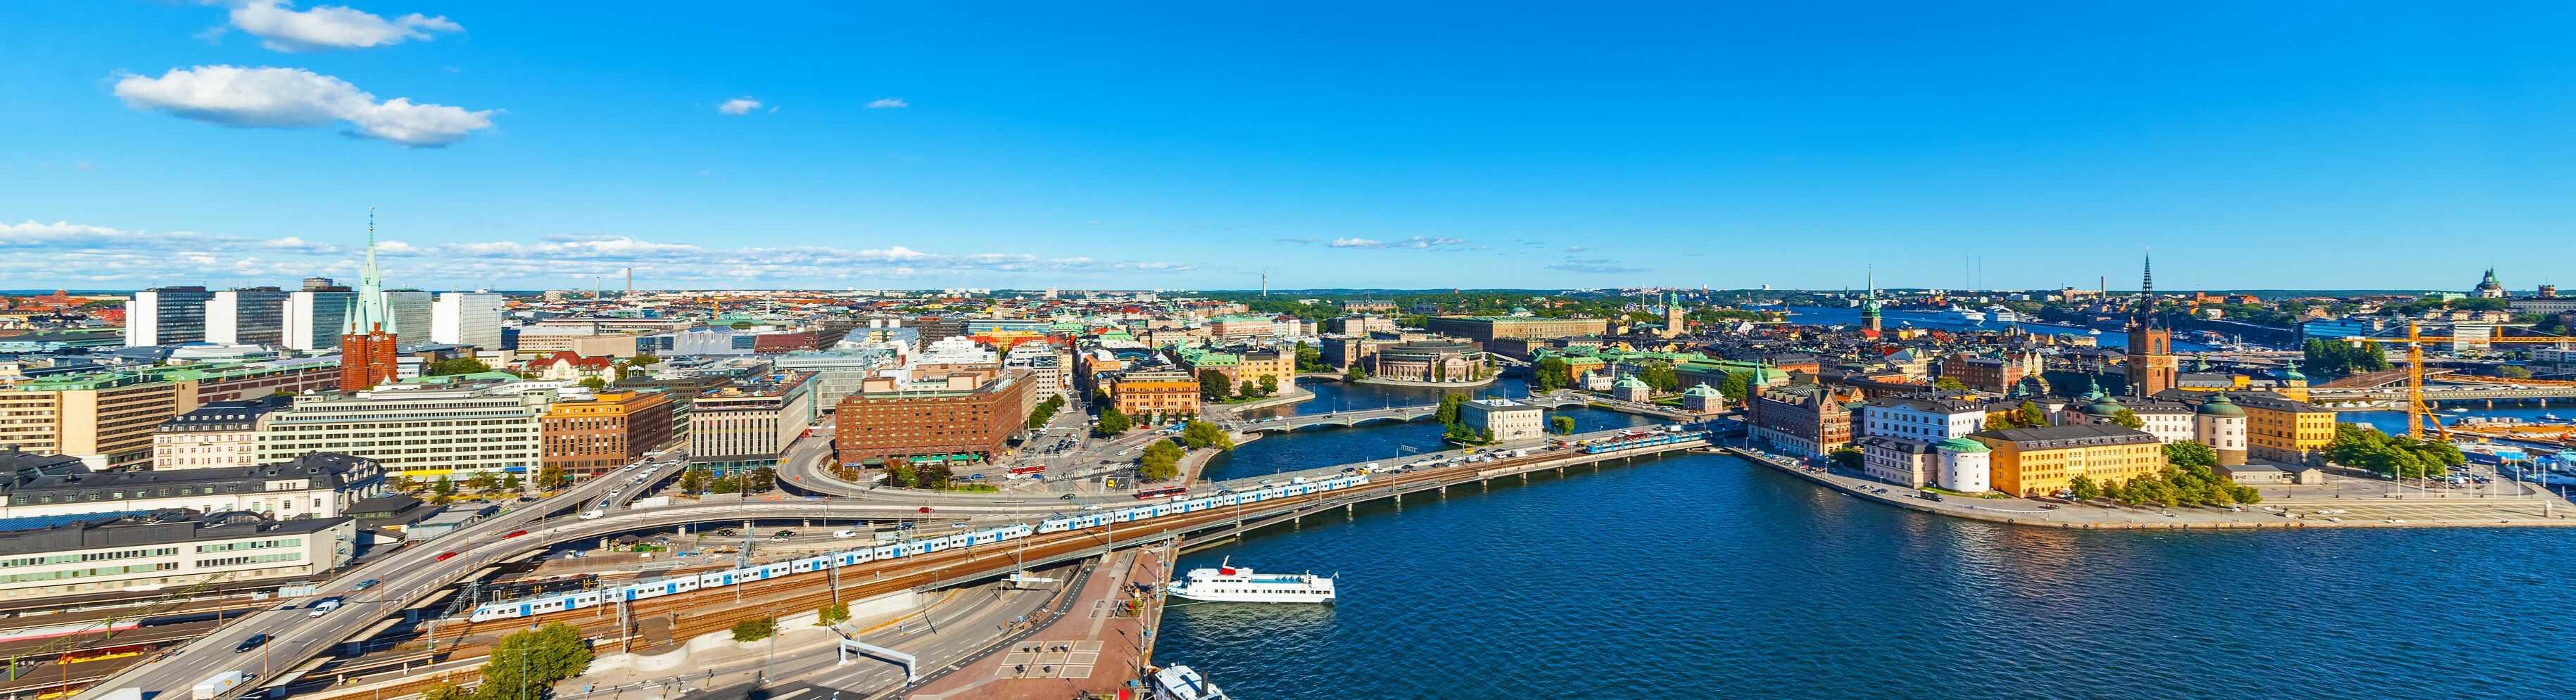 Vi asfalterar i Stockholm